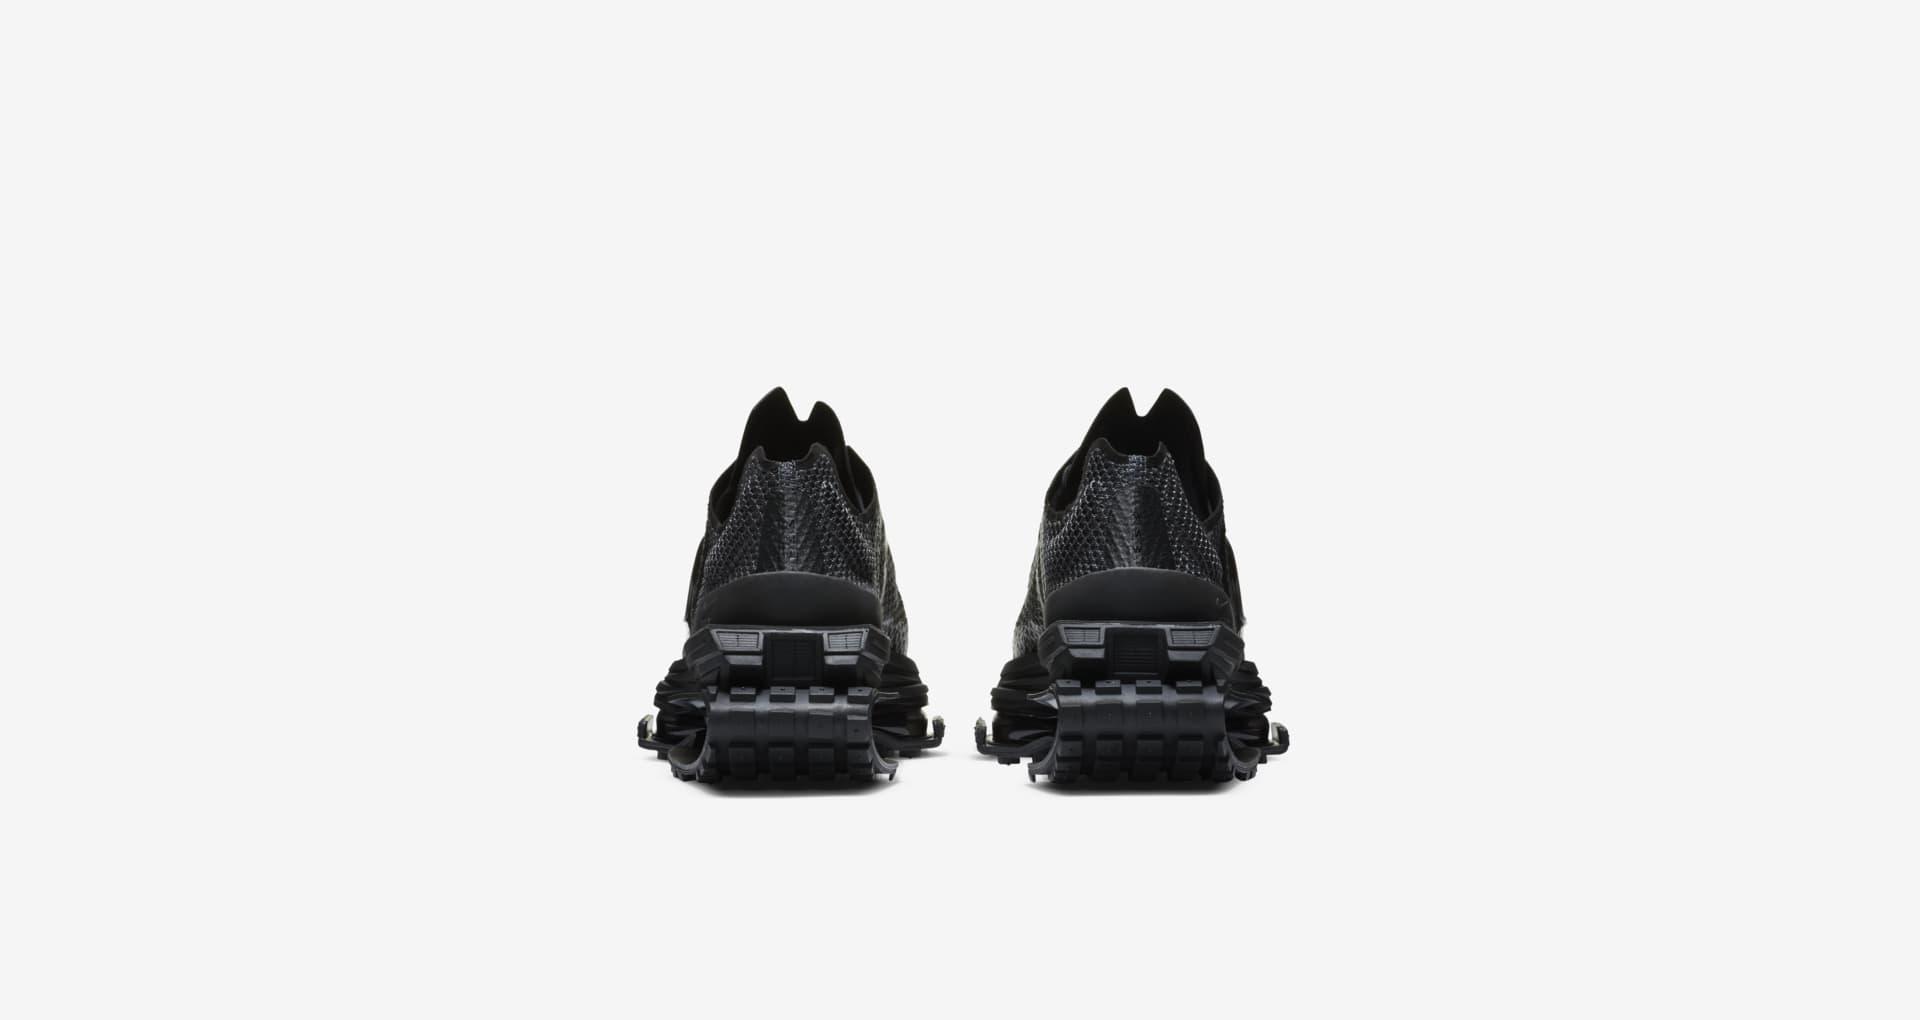 Nike,MMW 4,DC7442-001,DC7442-8  Nike 天价联名又来了!MMW「坦克鞋」现已上架 SNKRS!